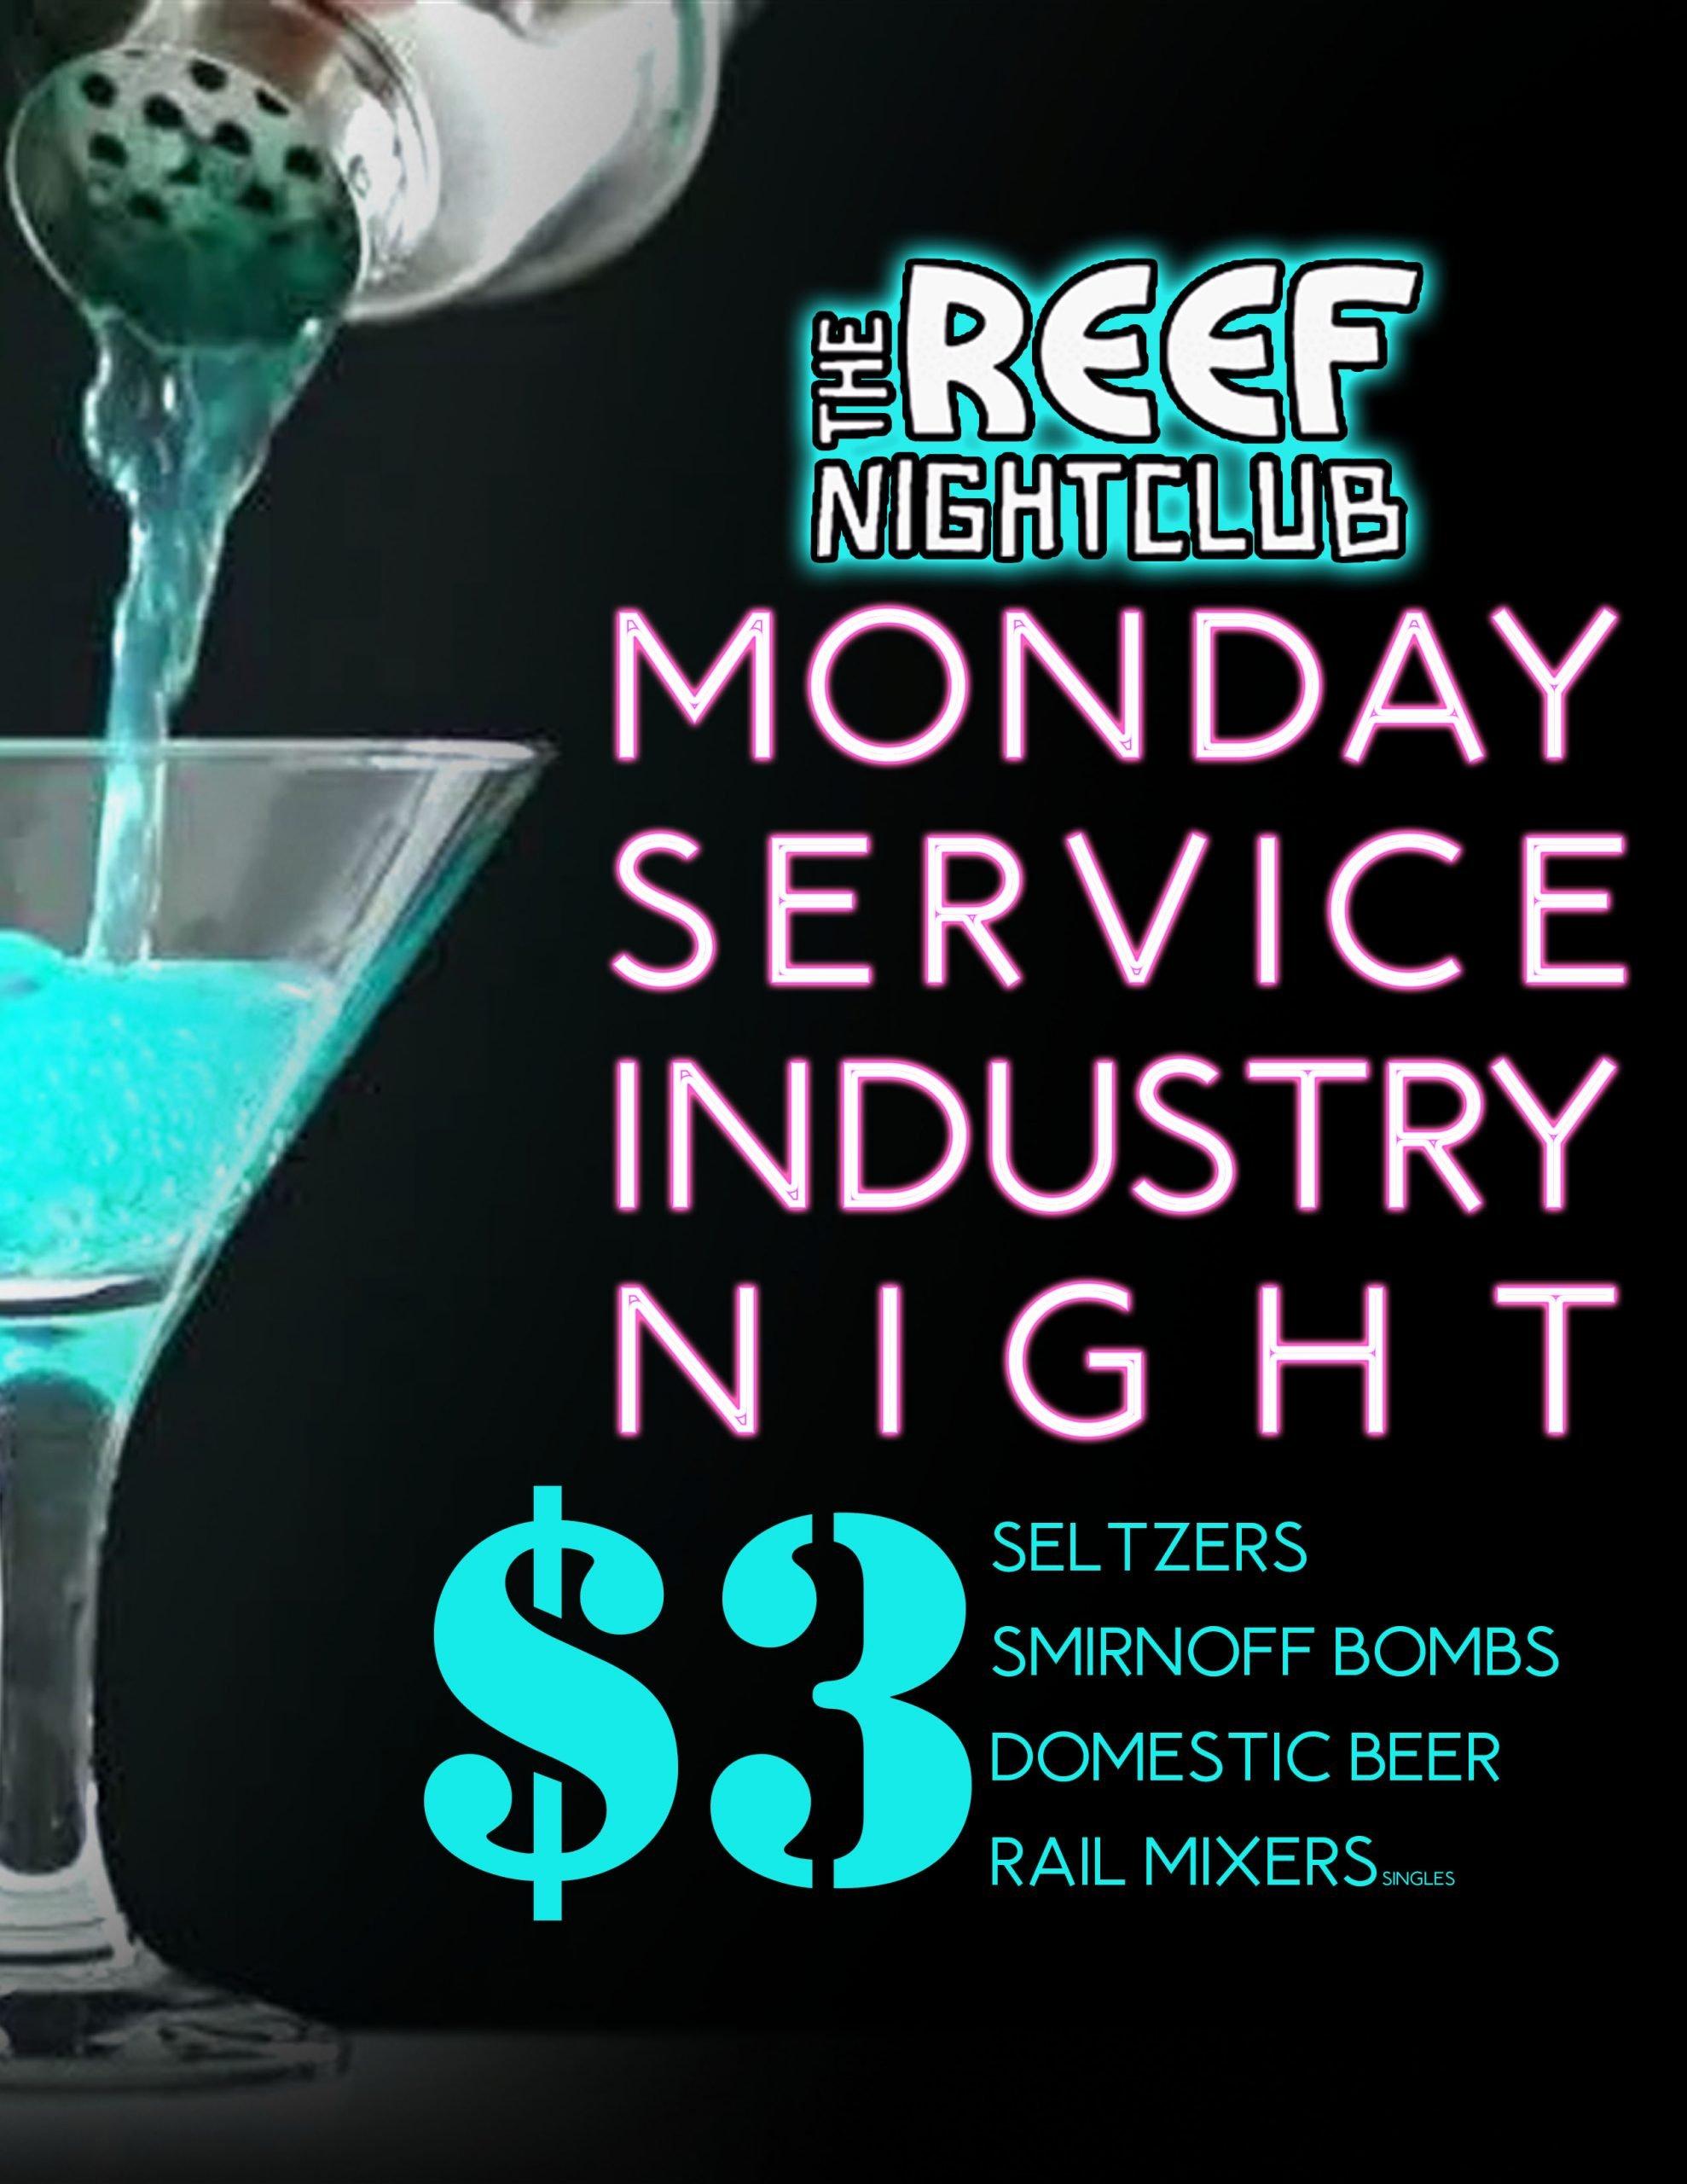 The Reef Night Club Service Industry Night